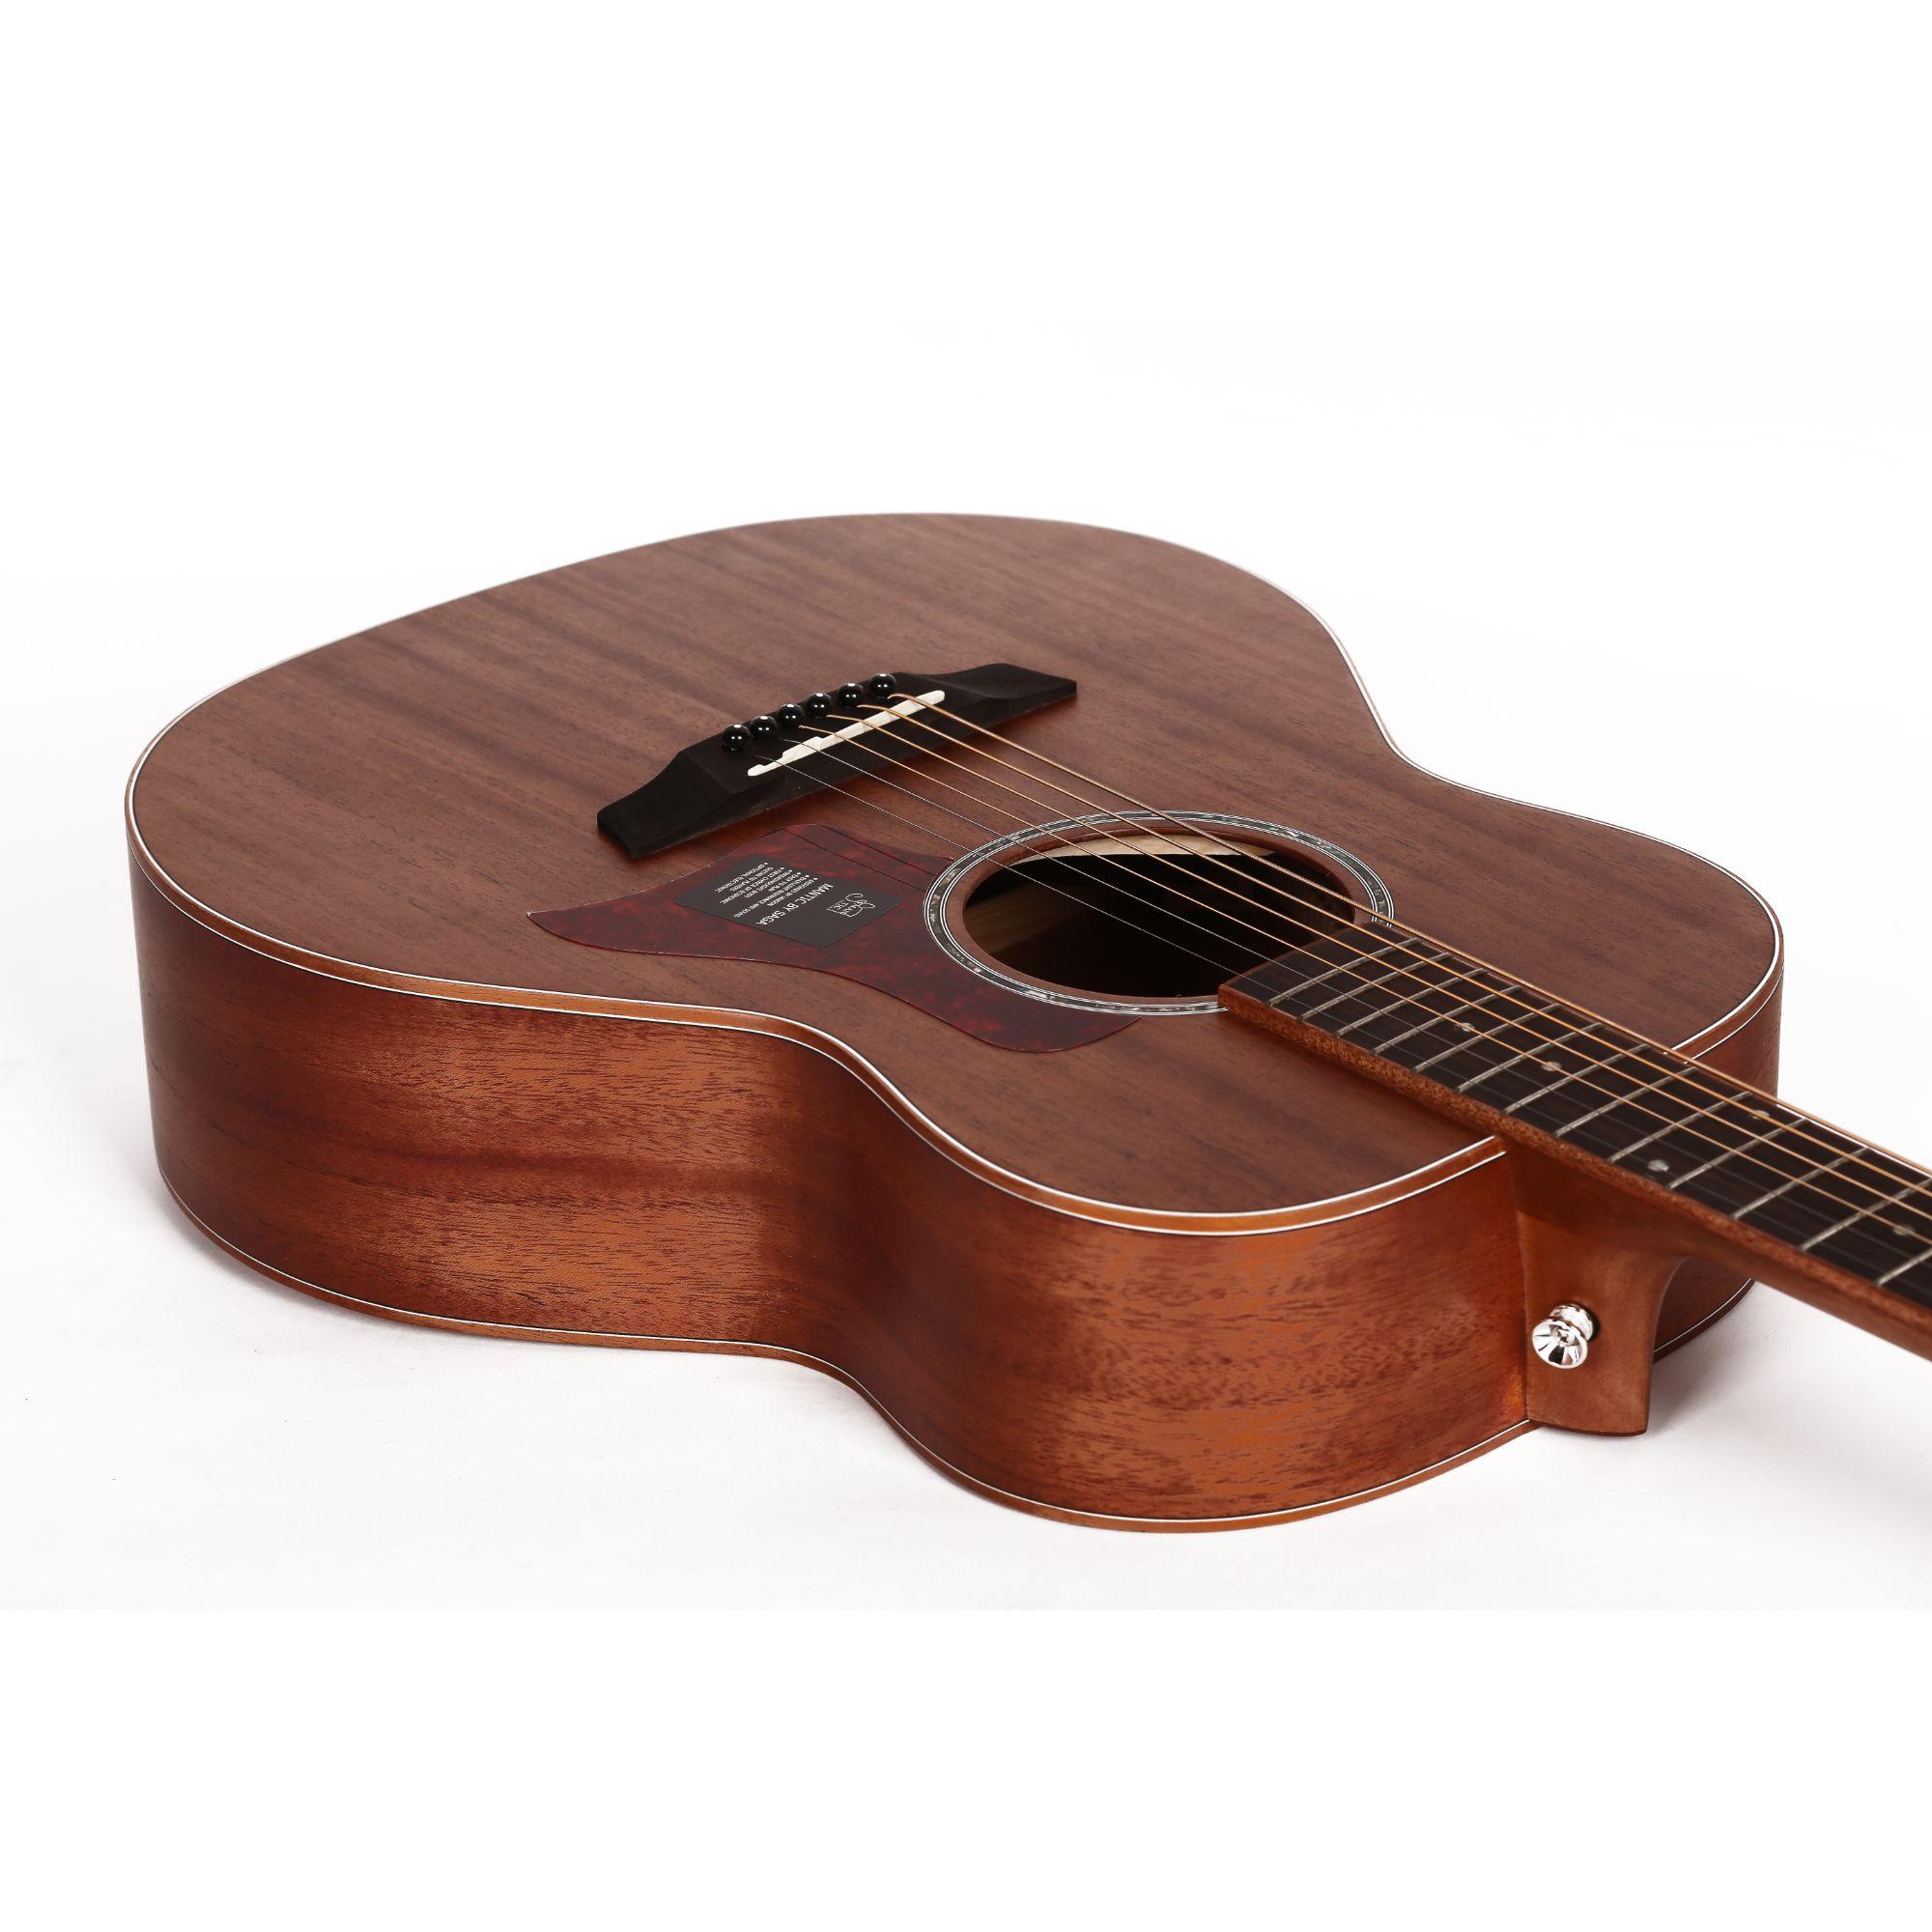 Mantic BG2S  Solid Top Travel Acoustic Guitar - Mahogany Finish